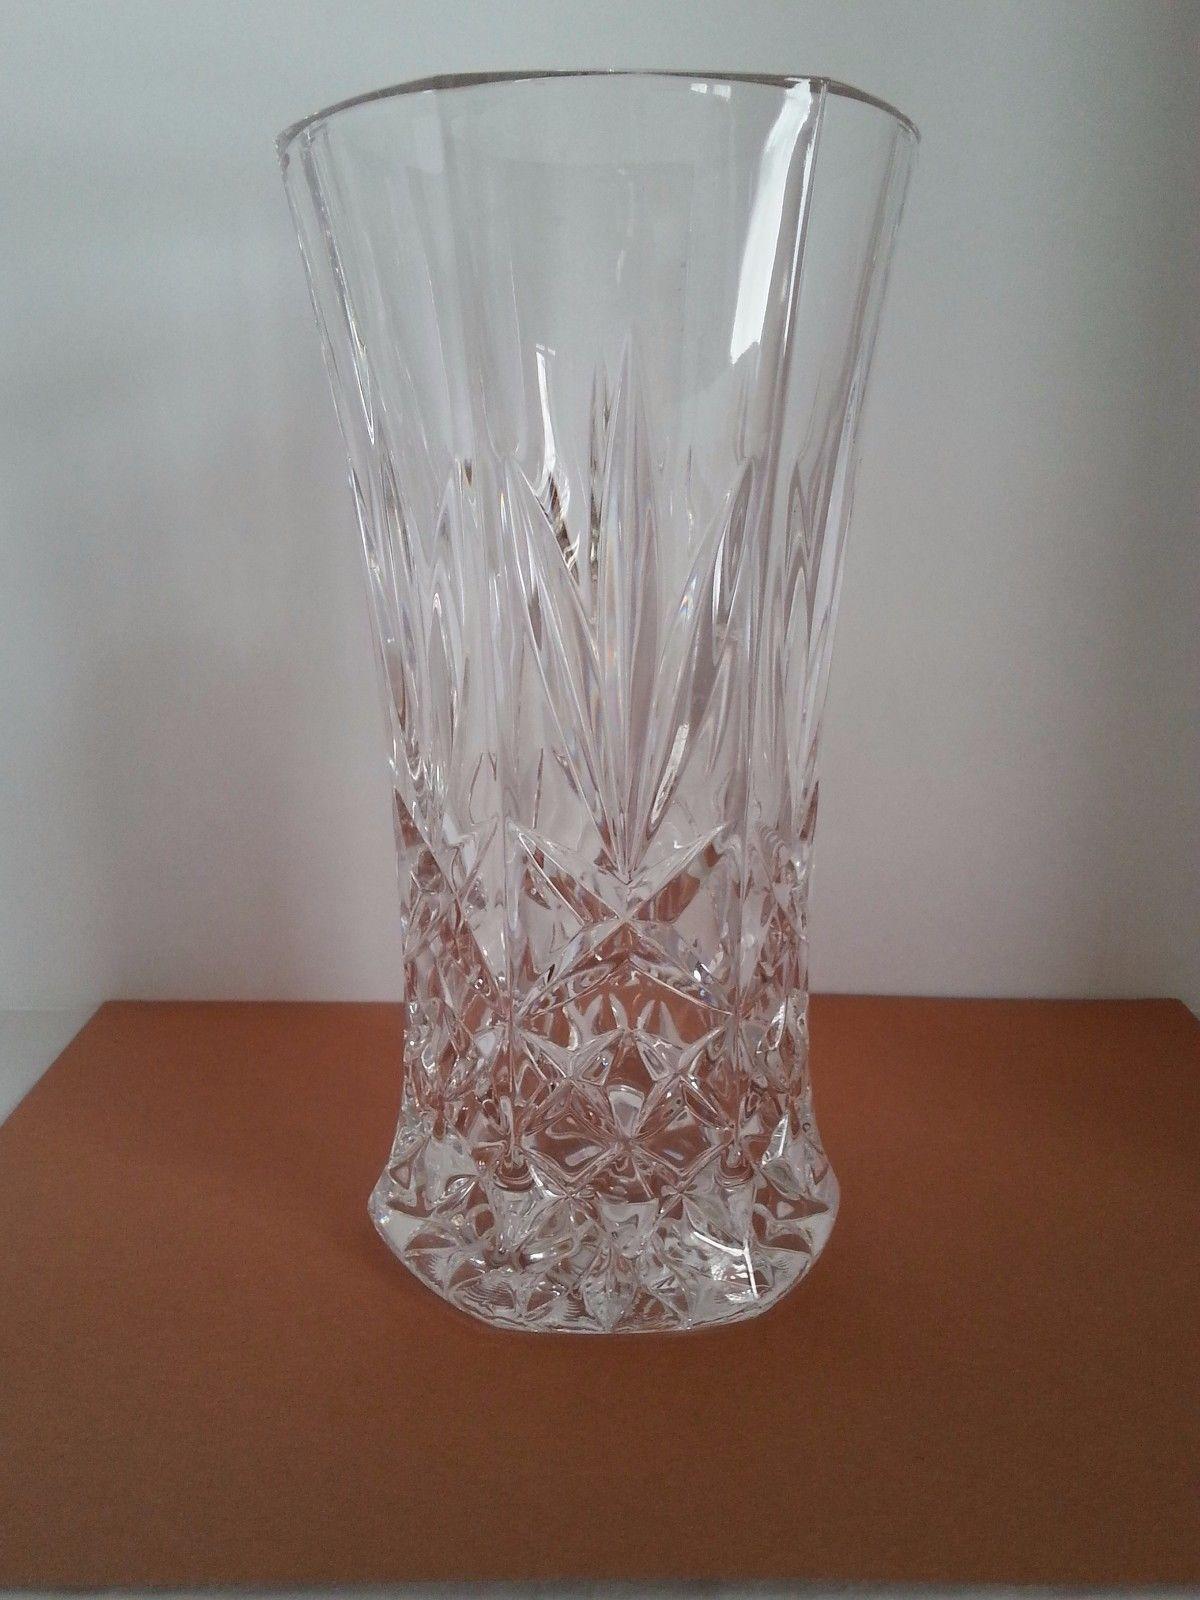 lead crystal cut glass vase of image result for vintage lead glass vase vintage pinterest pertaining to image result for vintage lead glass vase